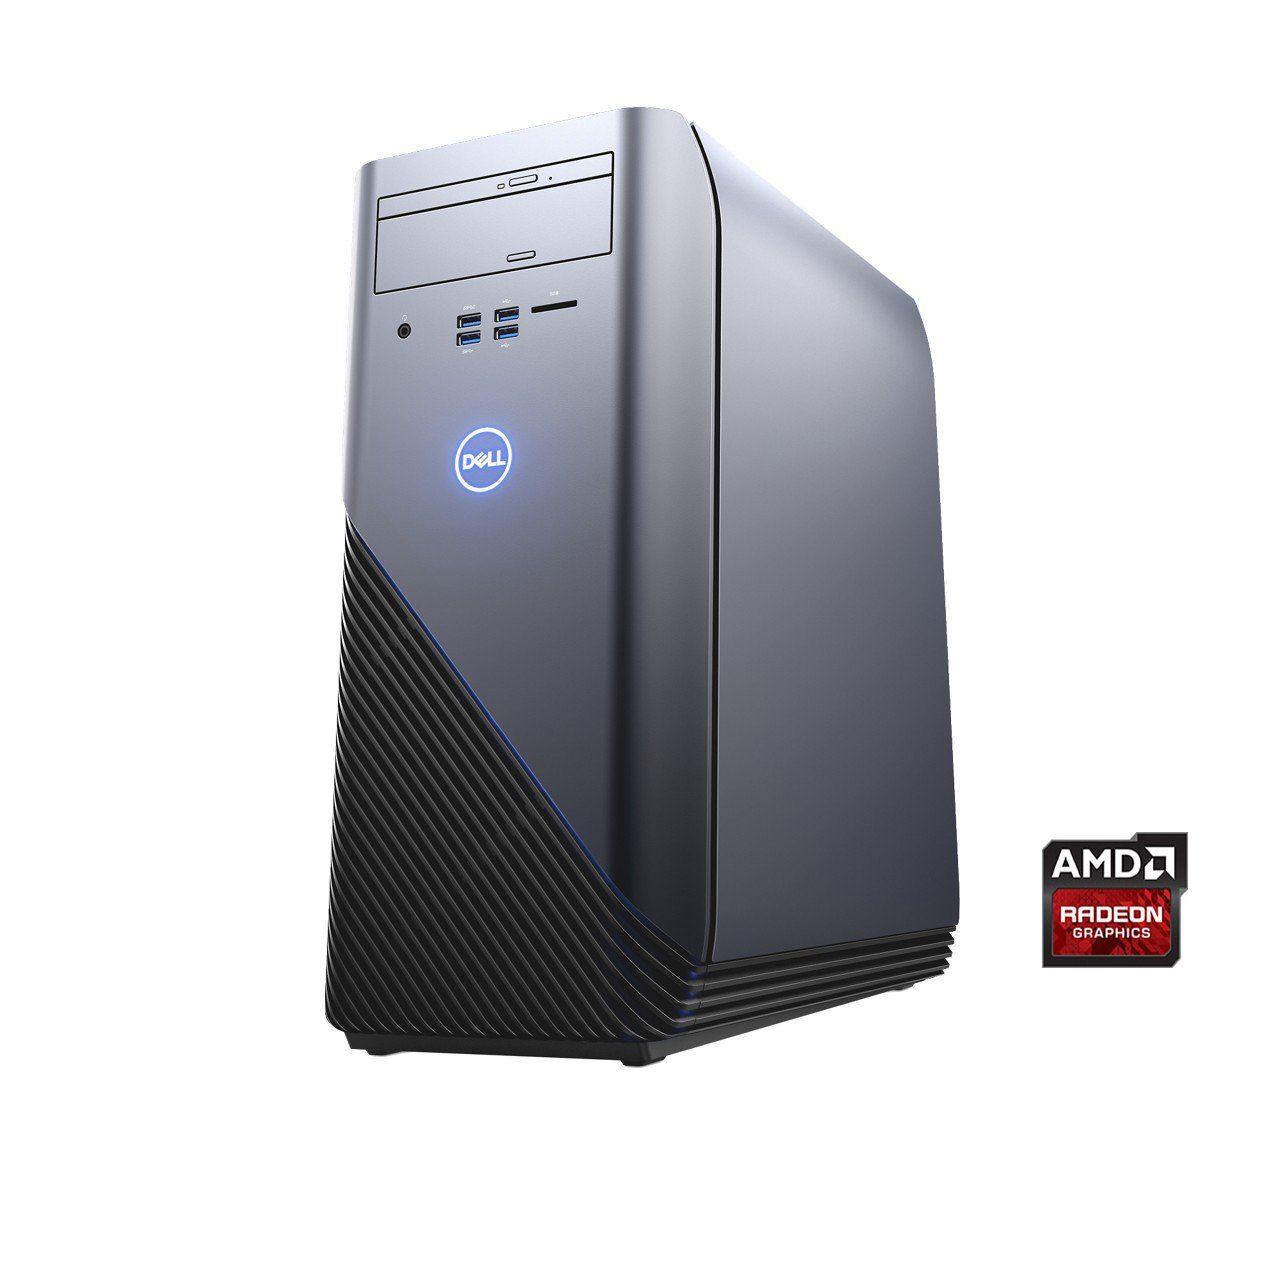 Dell EMC Gaming-PC »INSPIRON 5675 AMD R7-1700X8C16T«